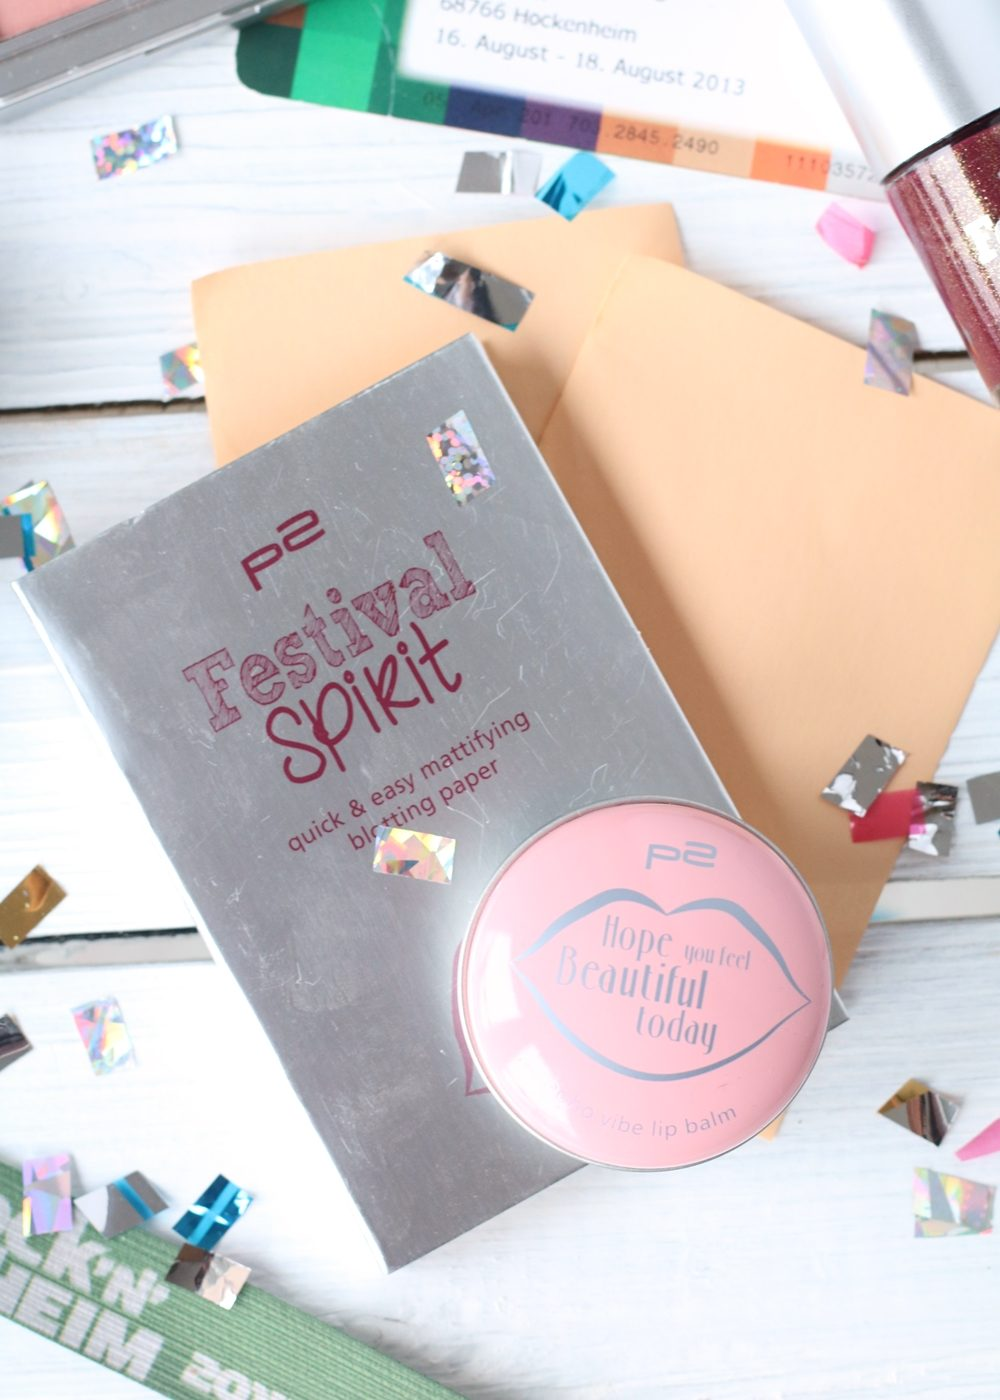 P2 Limited Edition Festival Spirit Nagellack Blush Lip Balm (3)